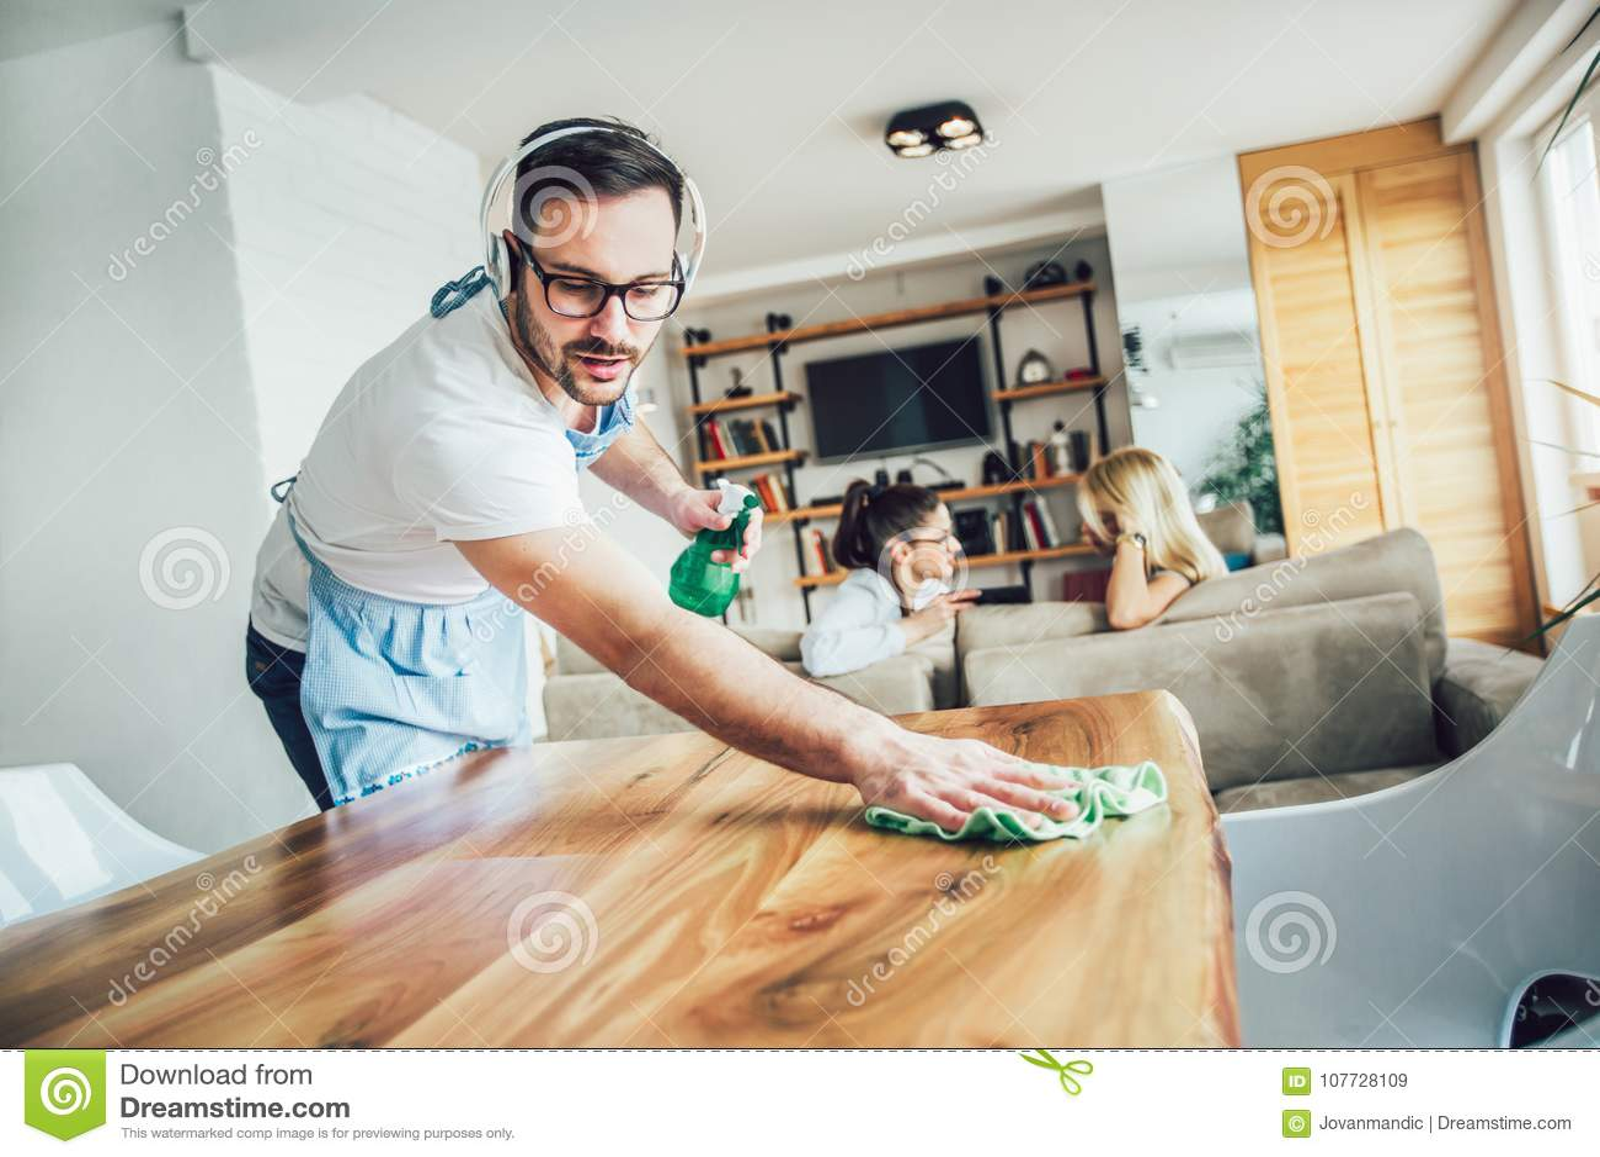 Męża housekeeping i cleaning pojęcie